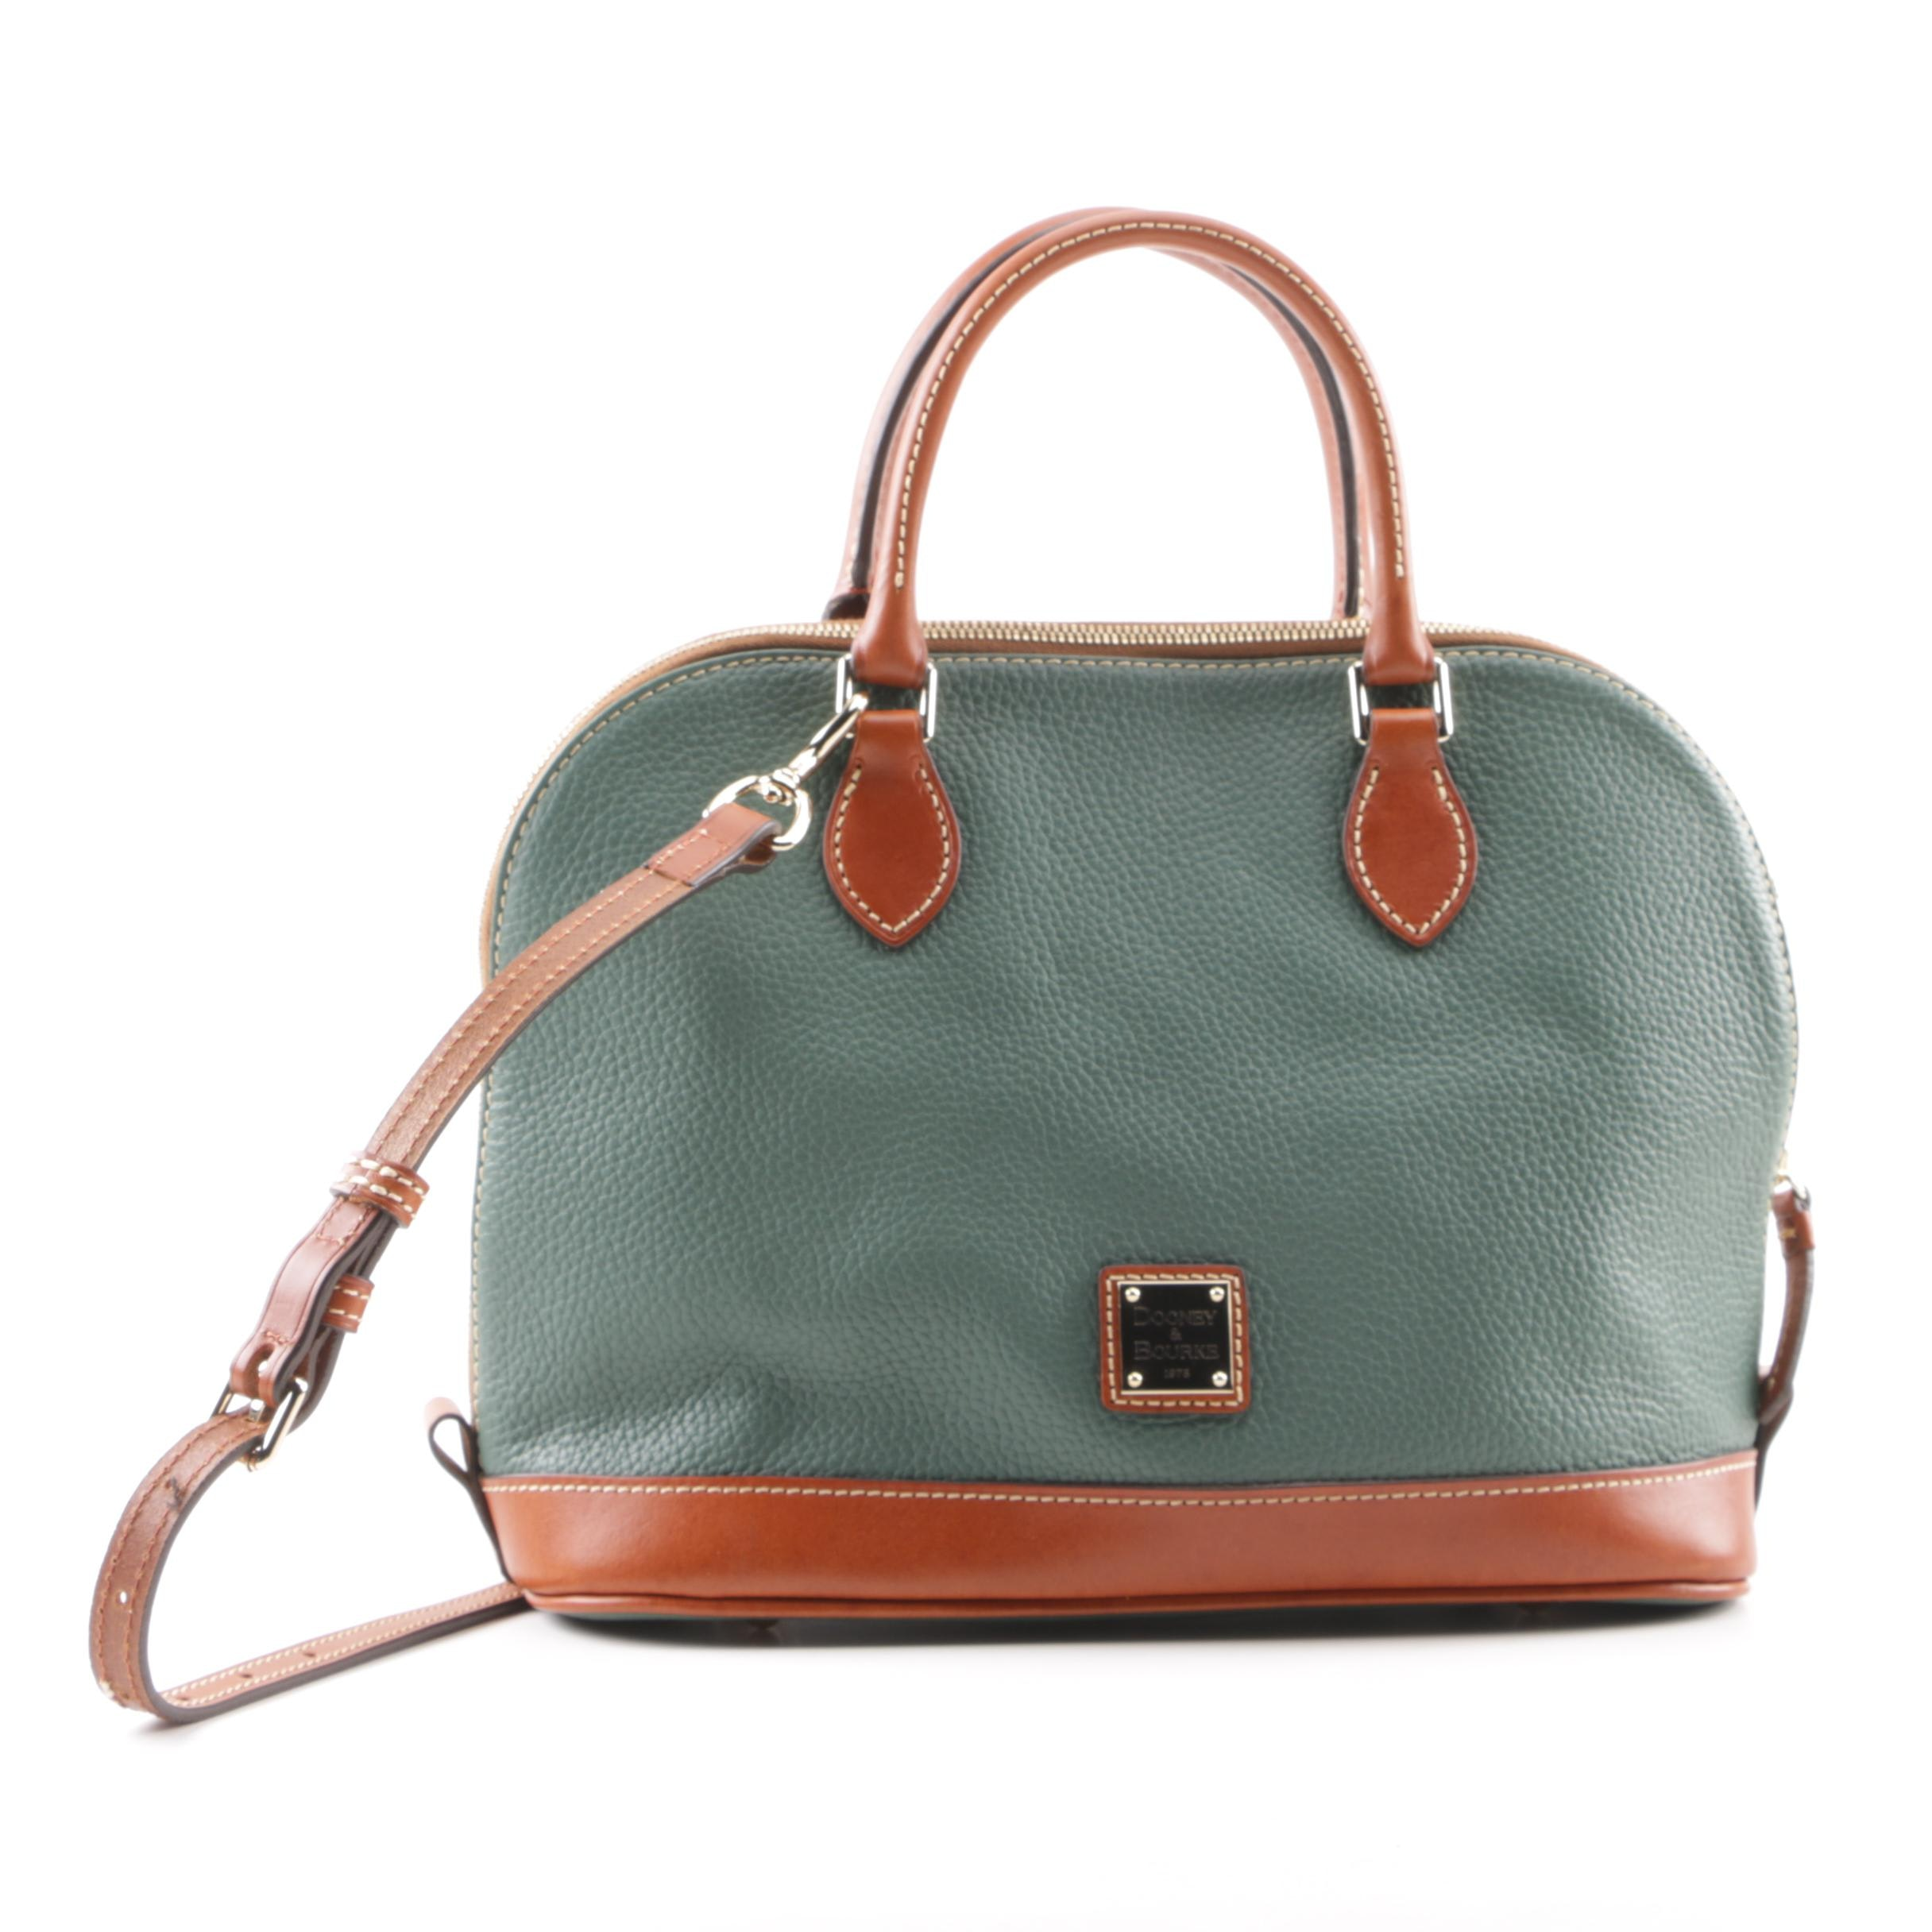 Dooney & Bourke Green All-Weather Leather Satchel